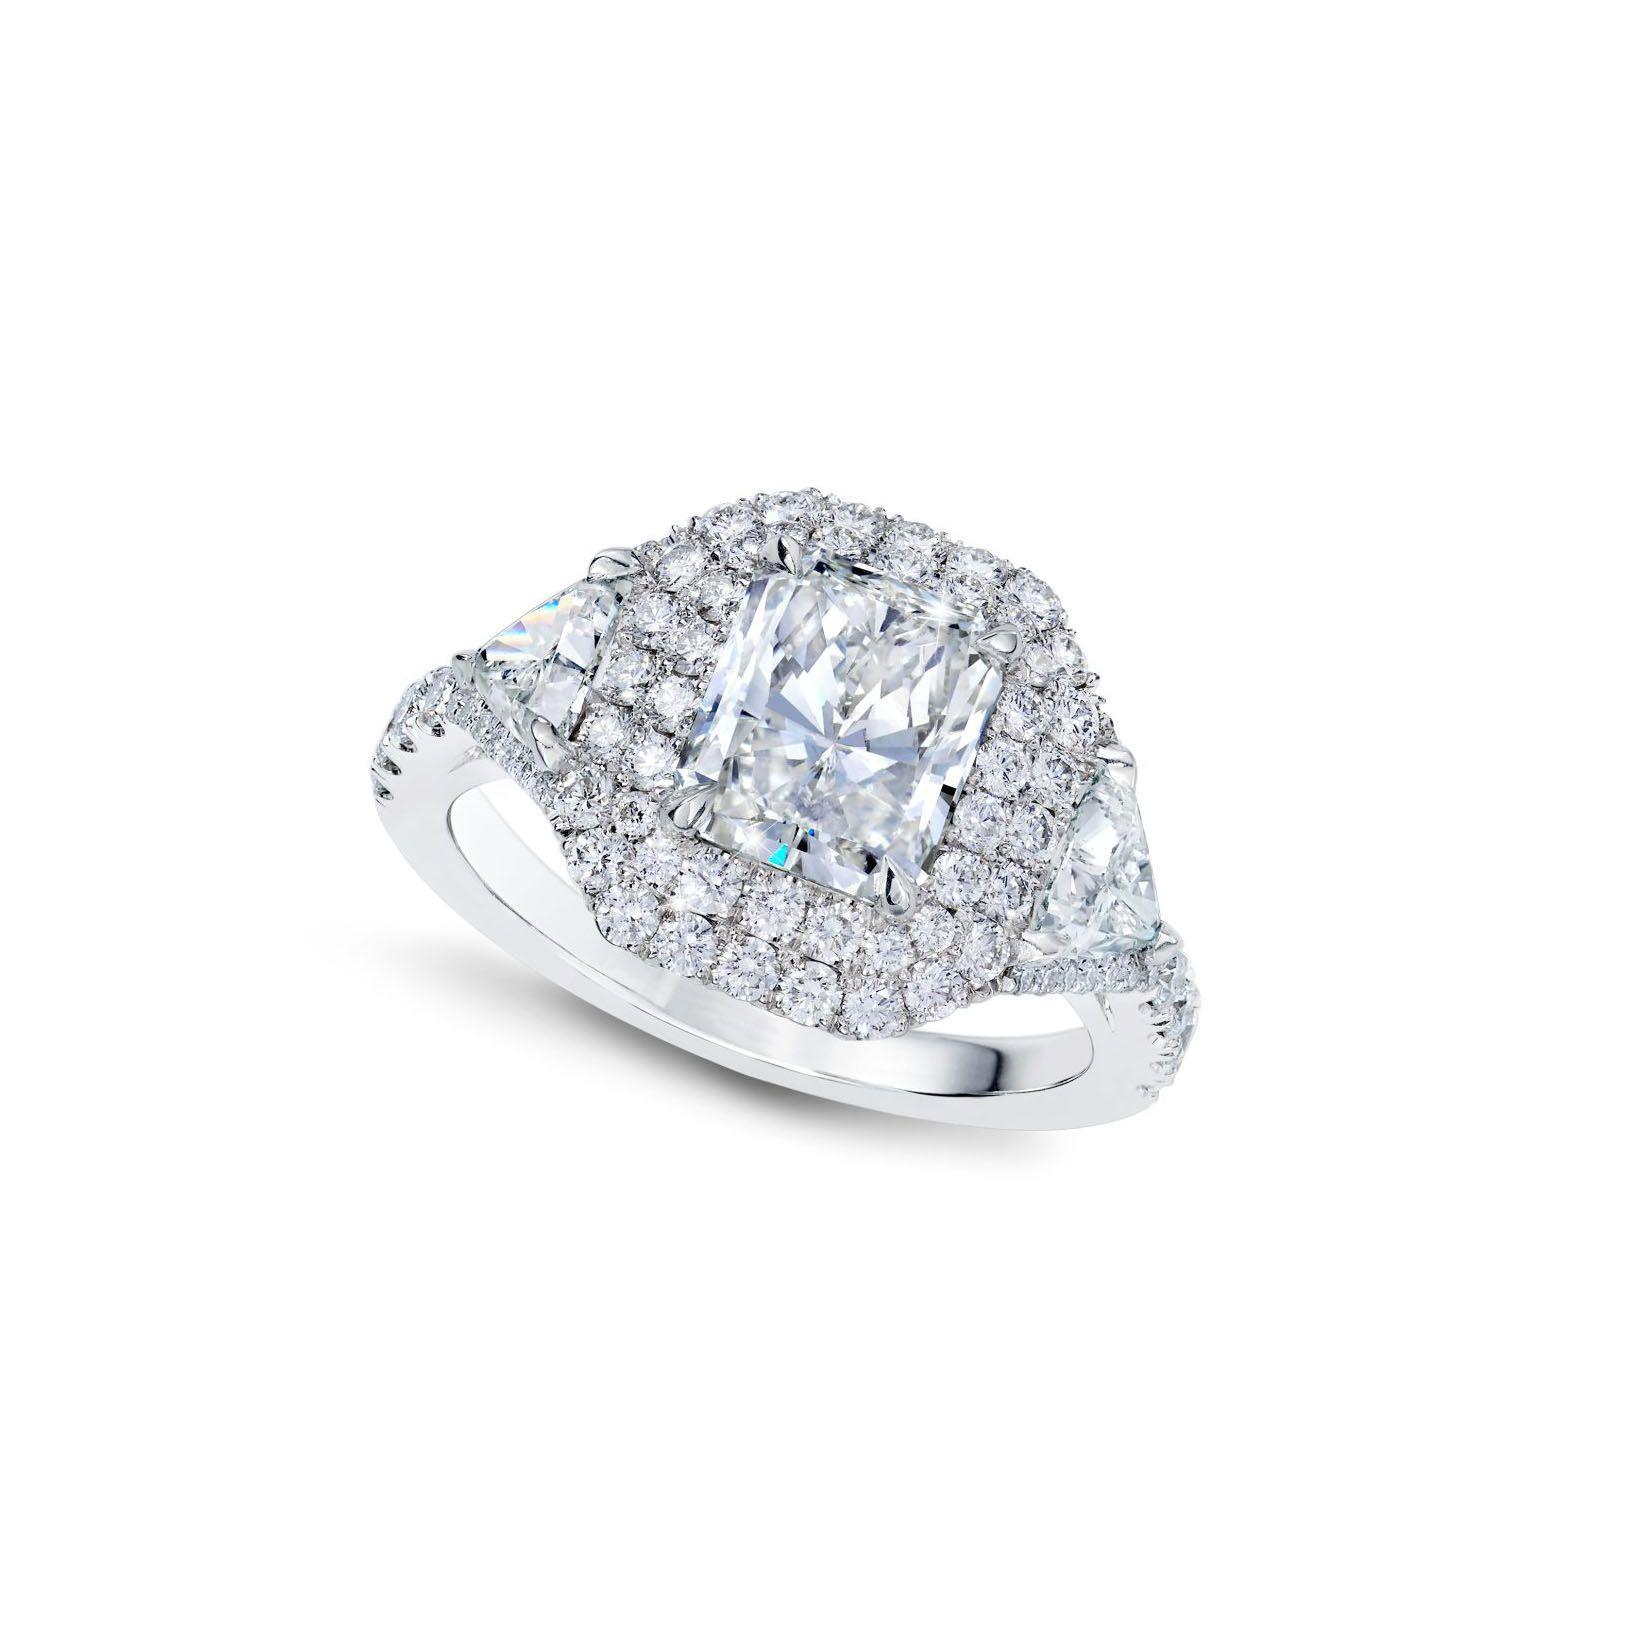 Lauren Addison Radiant-Cut Diamond Engagement Ring